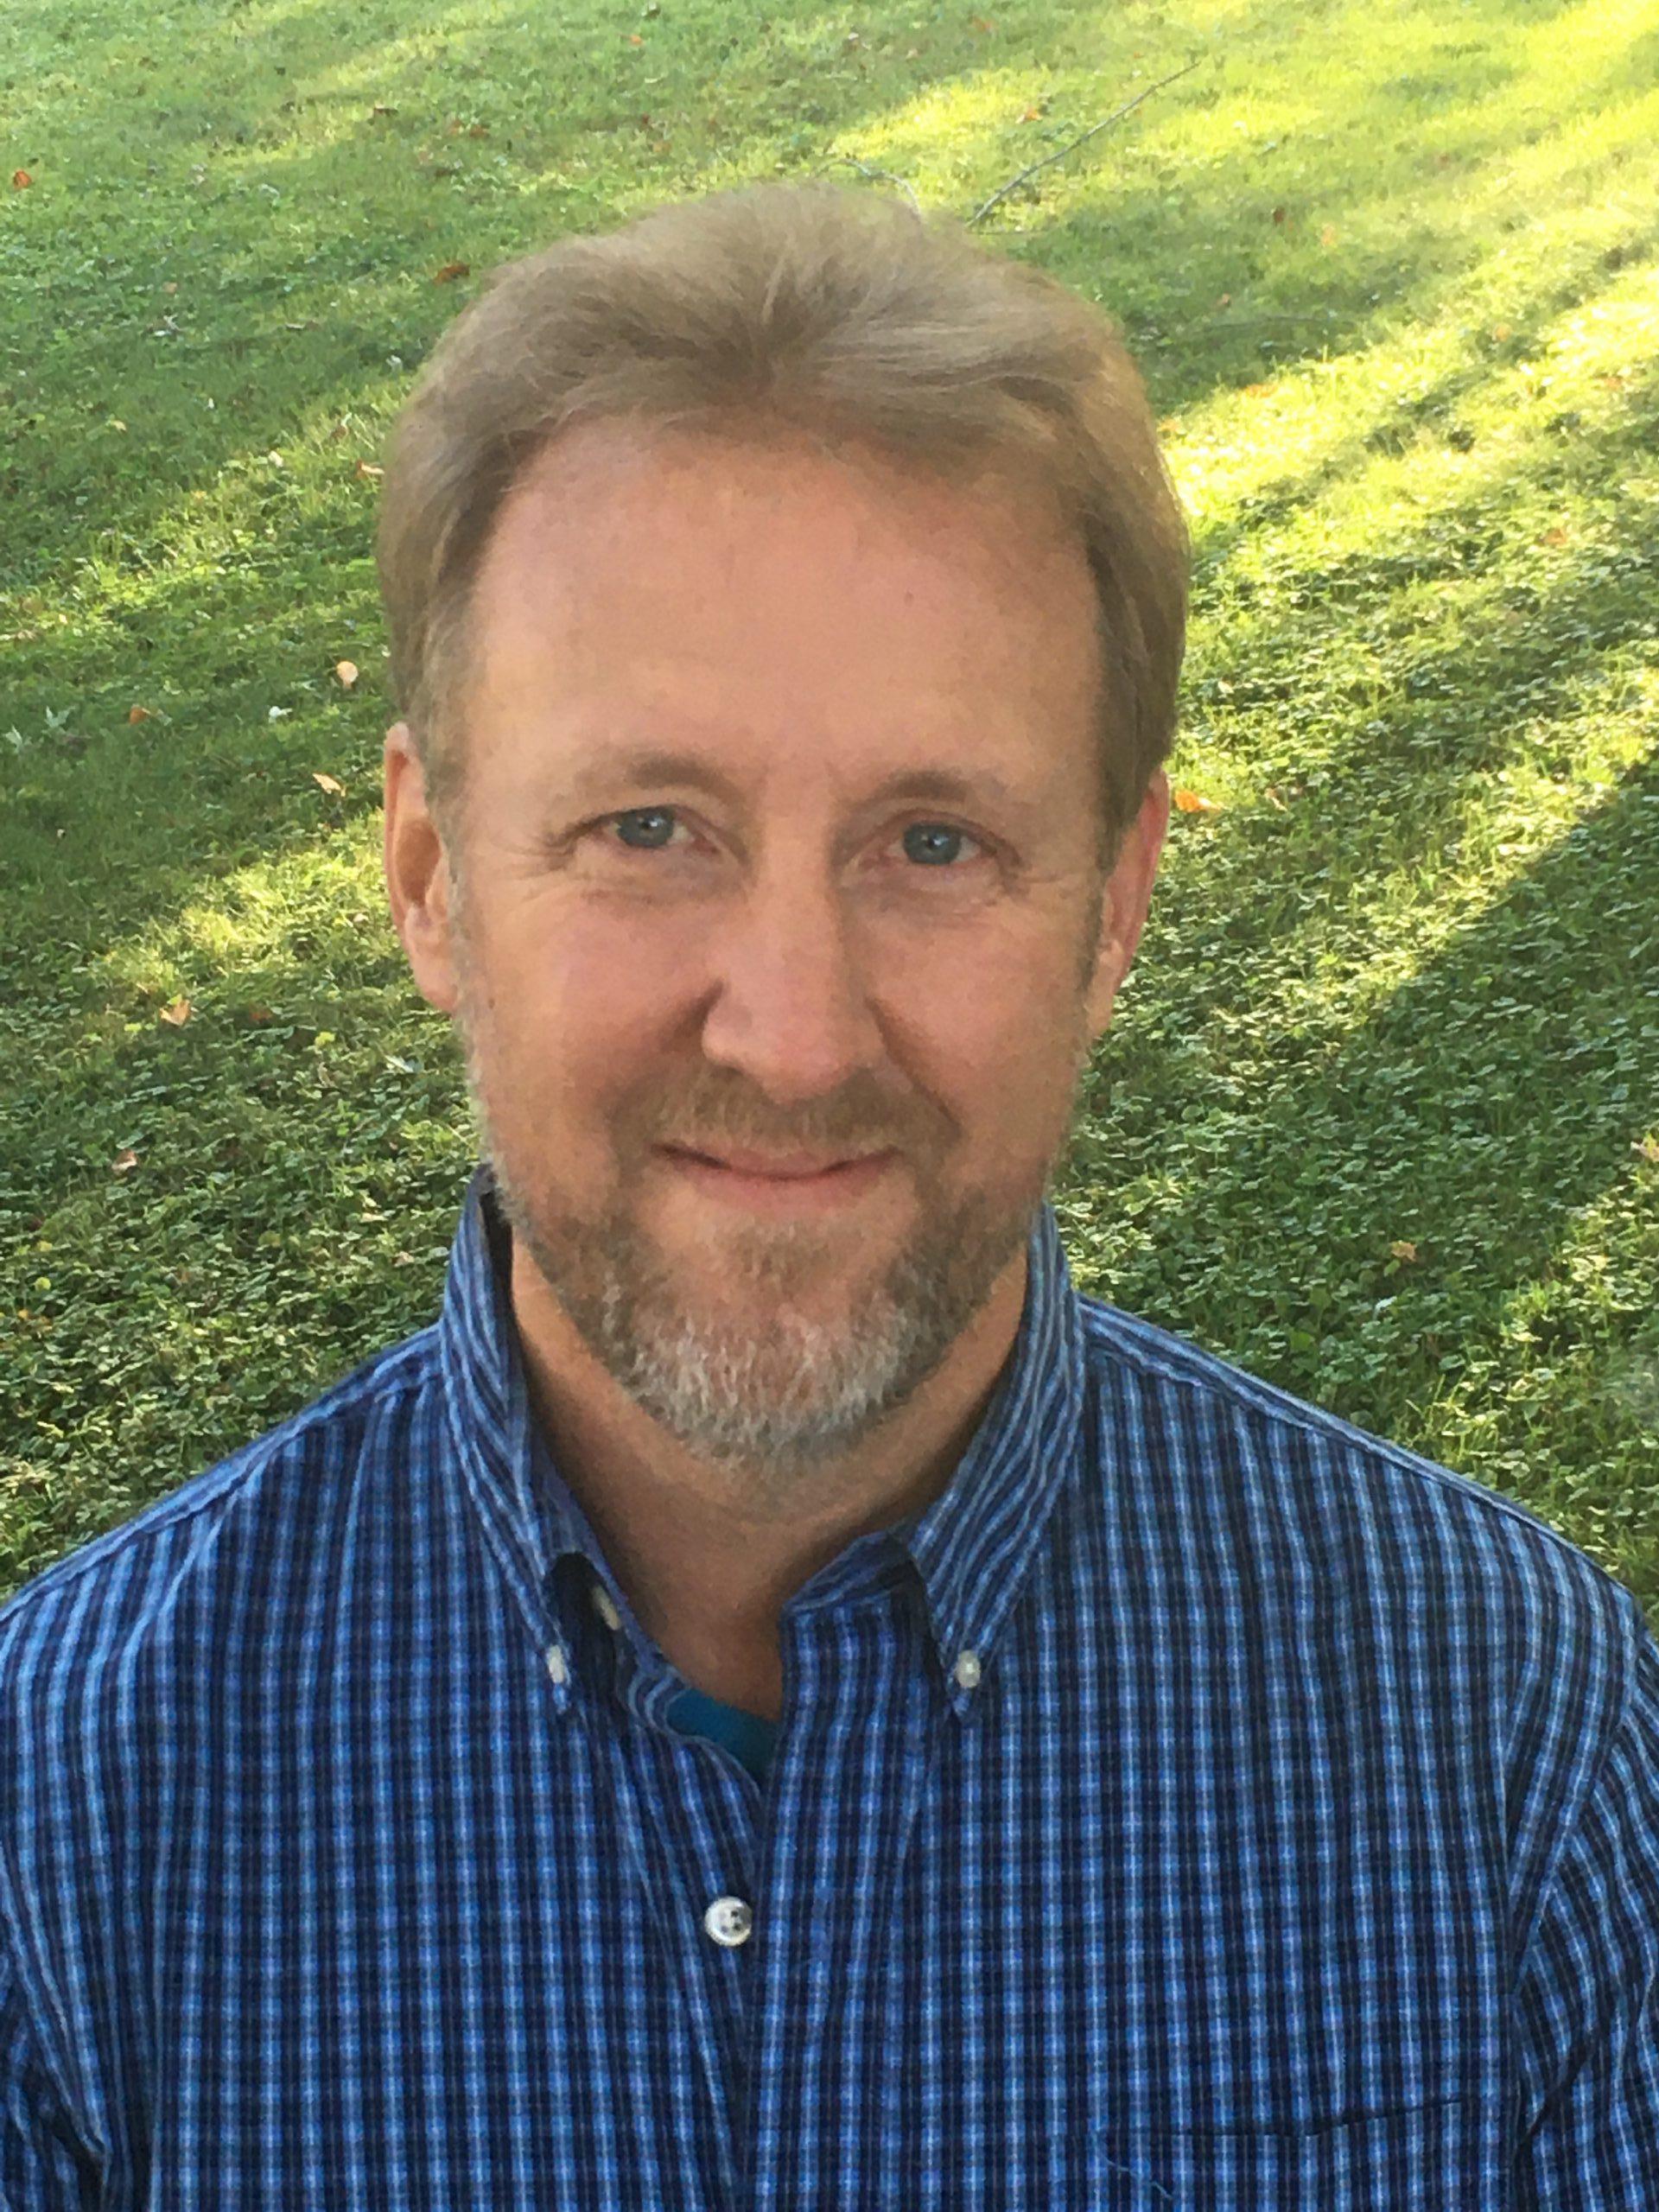 Eric Resler, M.Div, Psychotherapist Intern